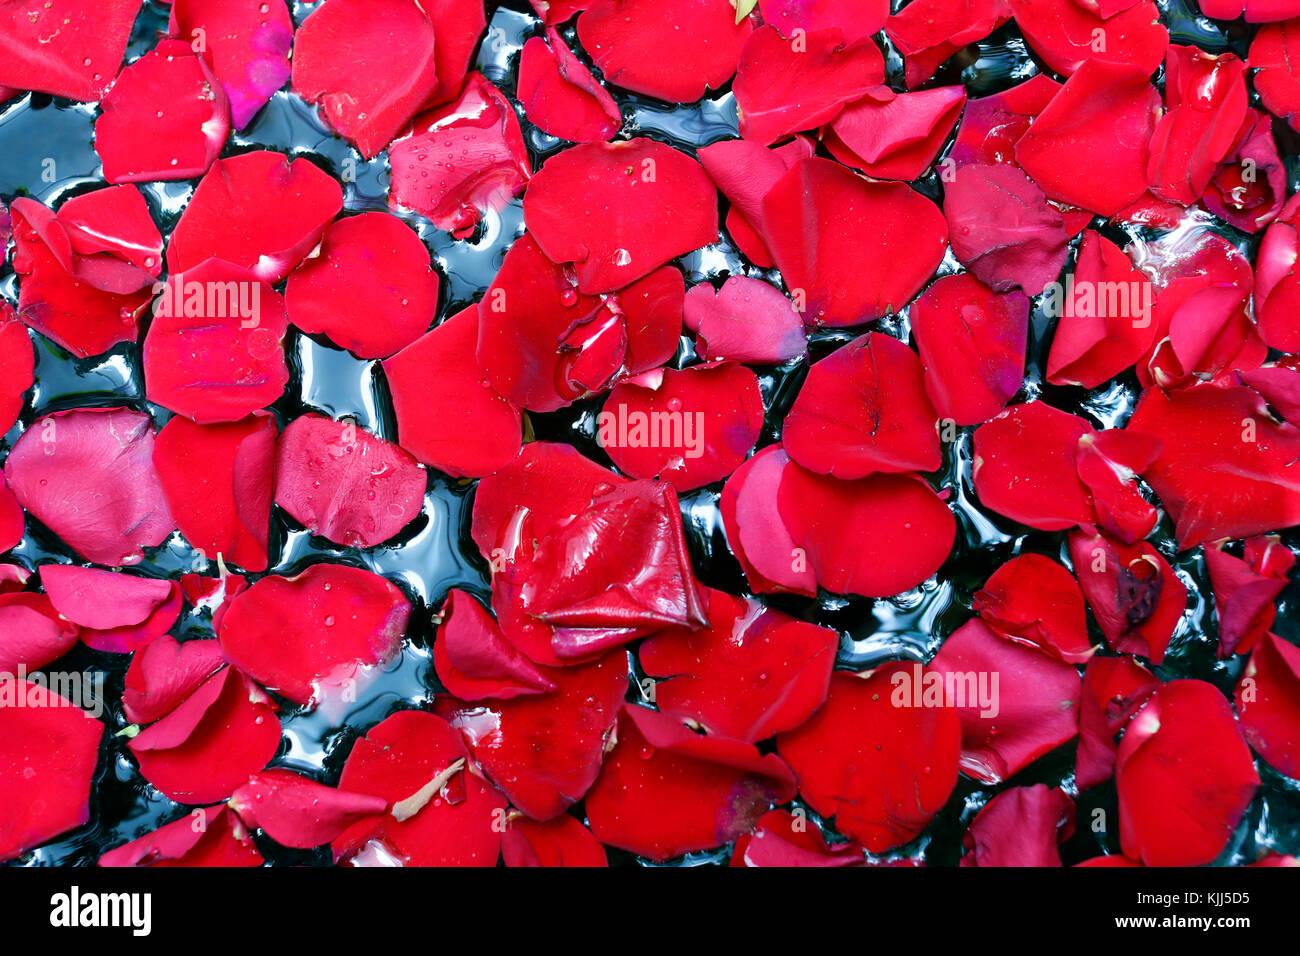 Detail shot of red rose petals. Vung Tau. Vietnam. - Stock Image